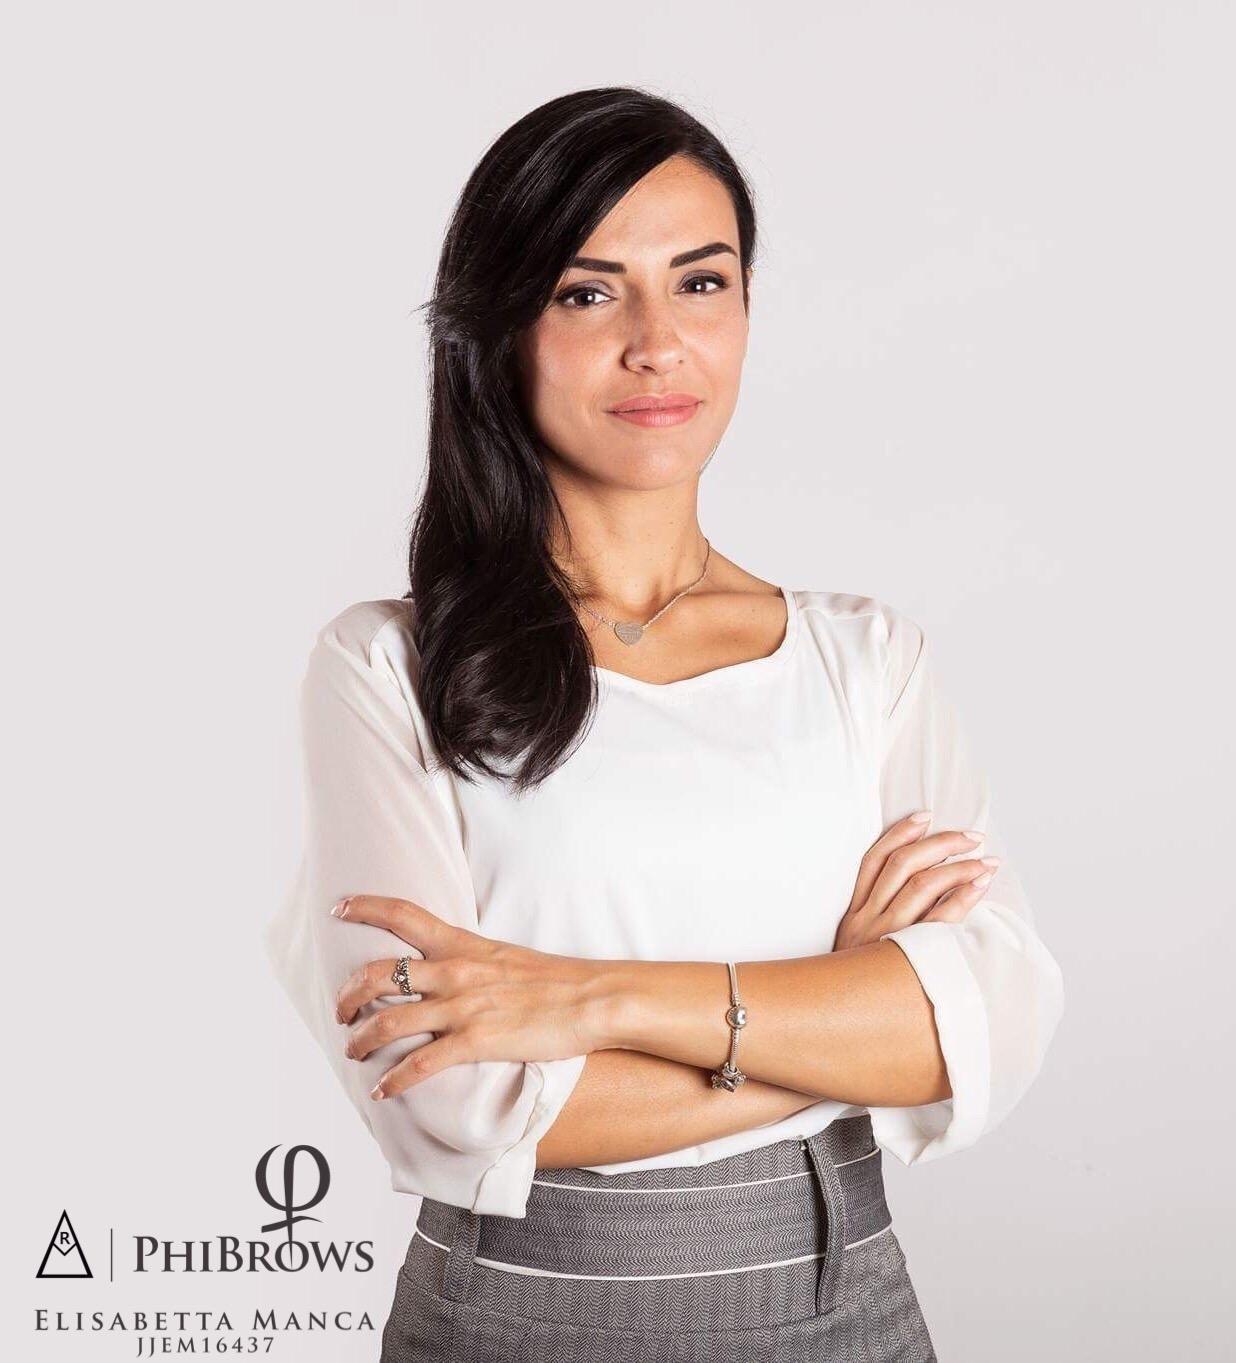 Elisabetta Manca Microblading